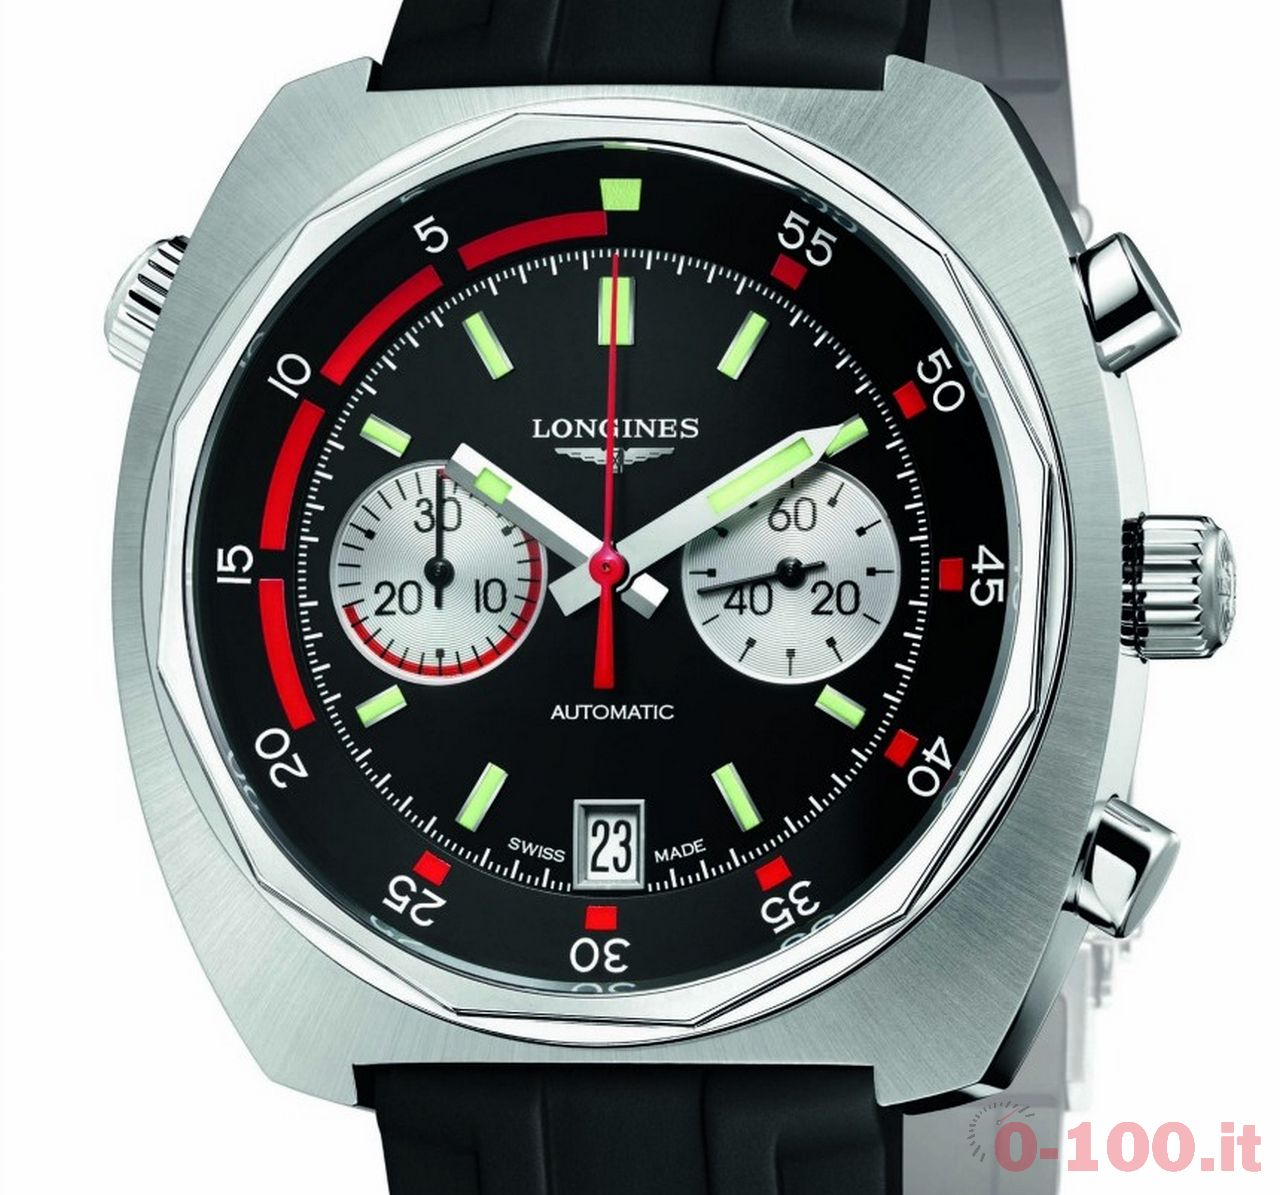 longines-heritage-diver-chronograph-ref-l2-796-4-52-9-prezzo-price_0-1002